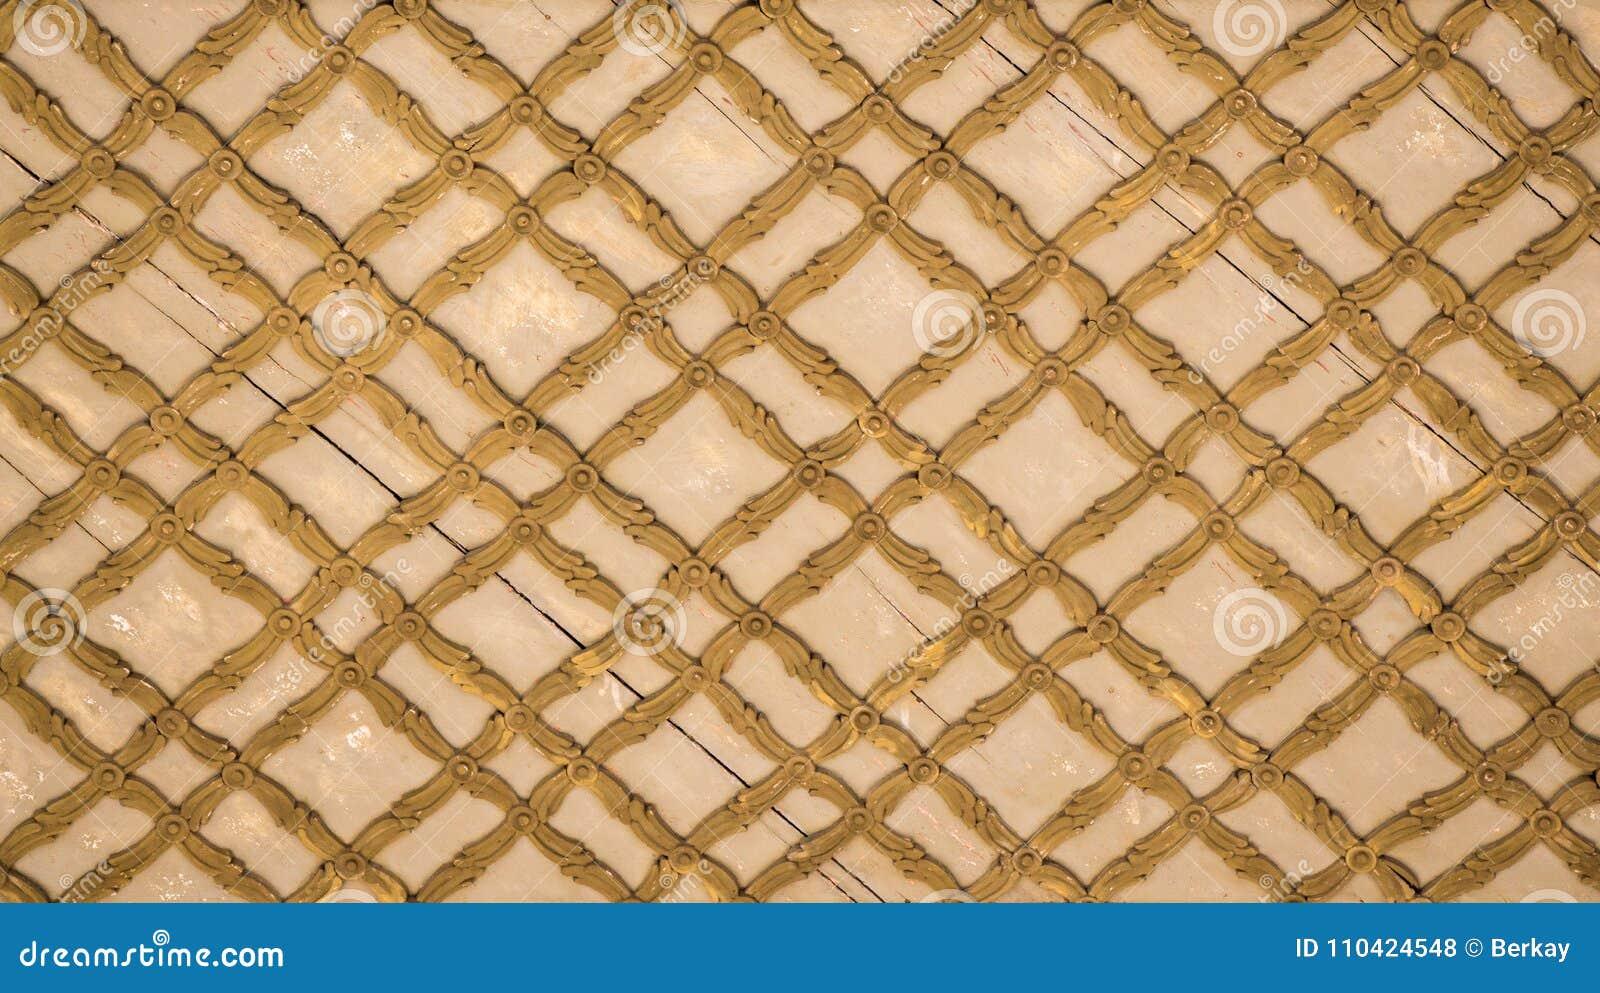 Ottoman Art With Geometric Patterns On Wood Stock Photo - Image of ...